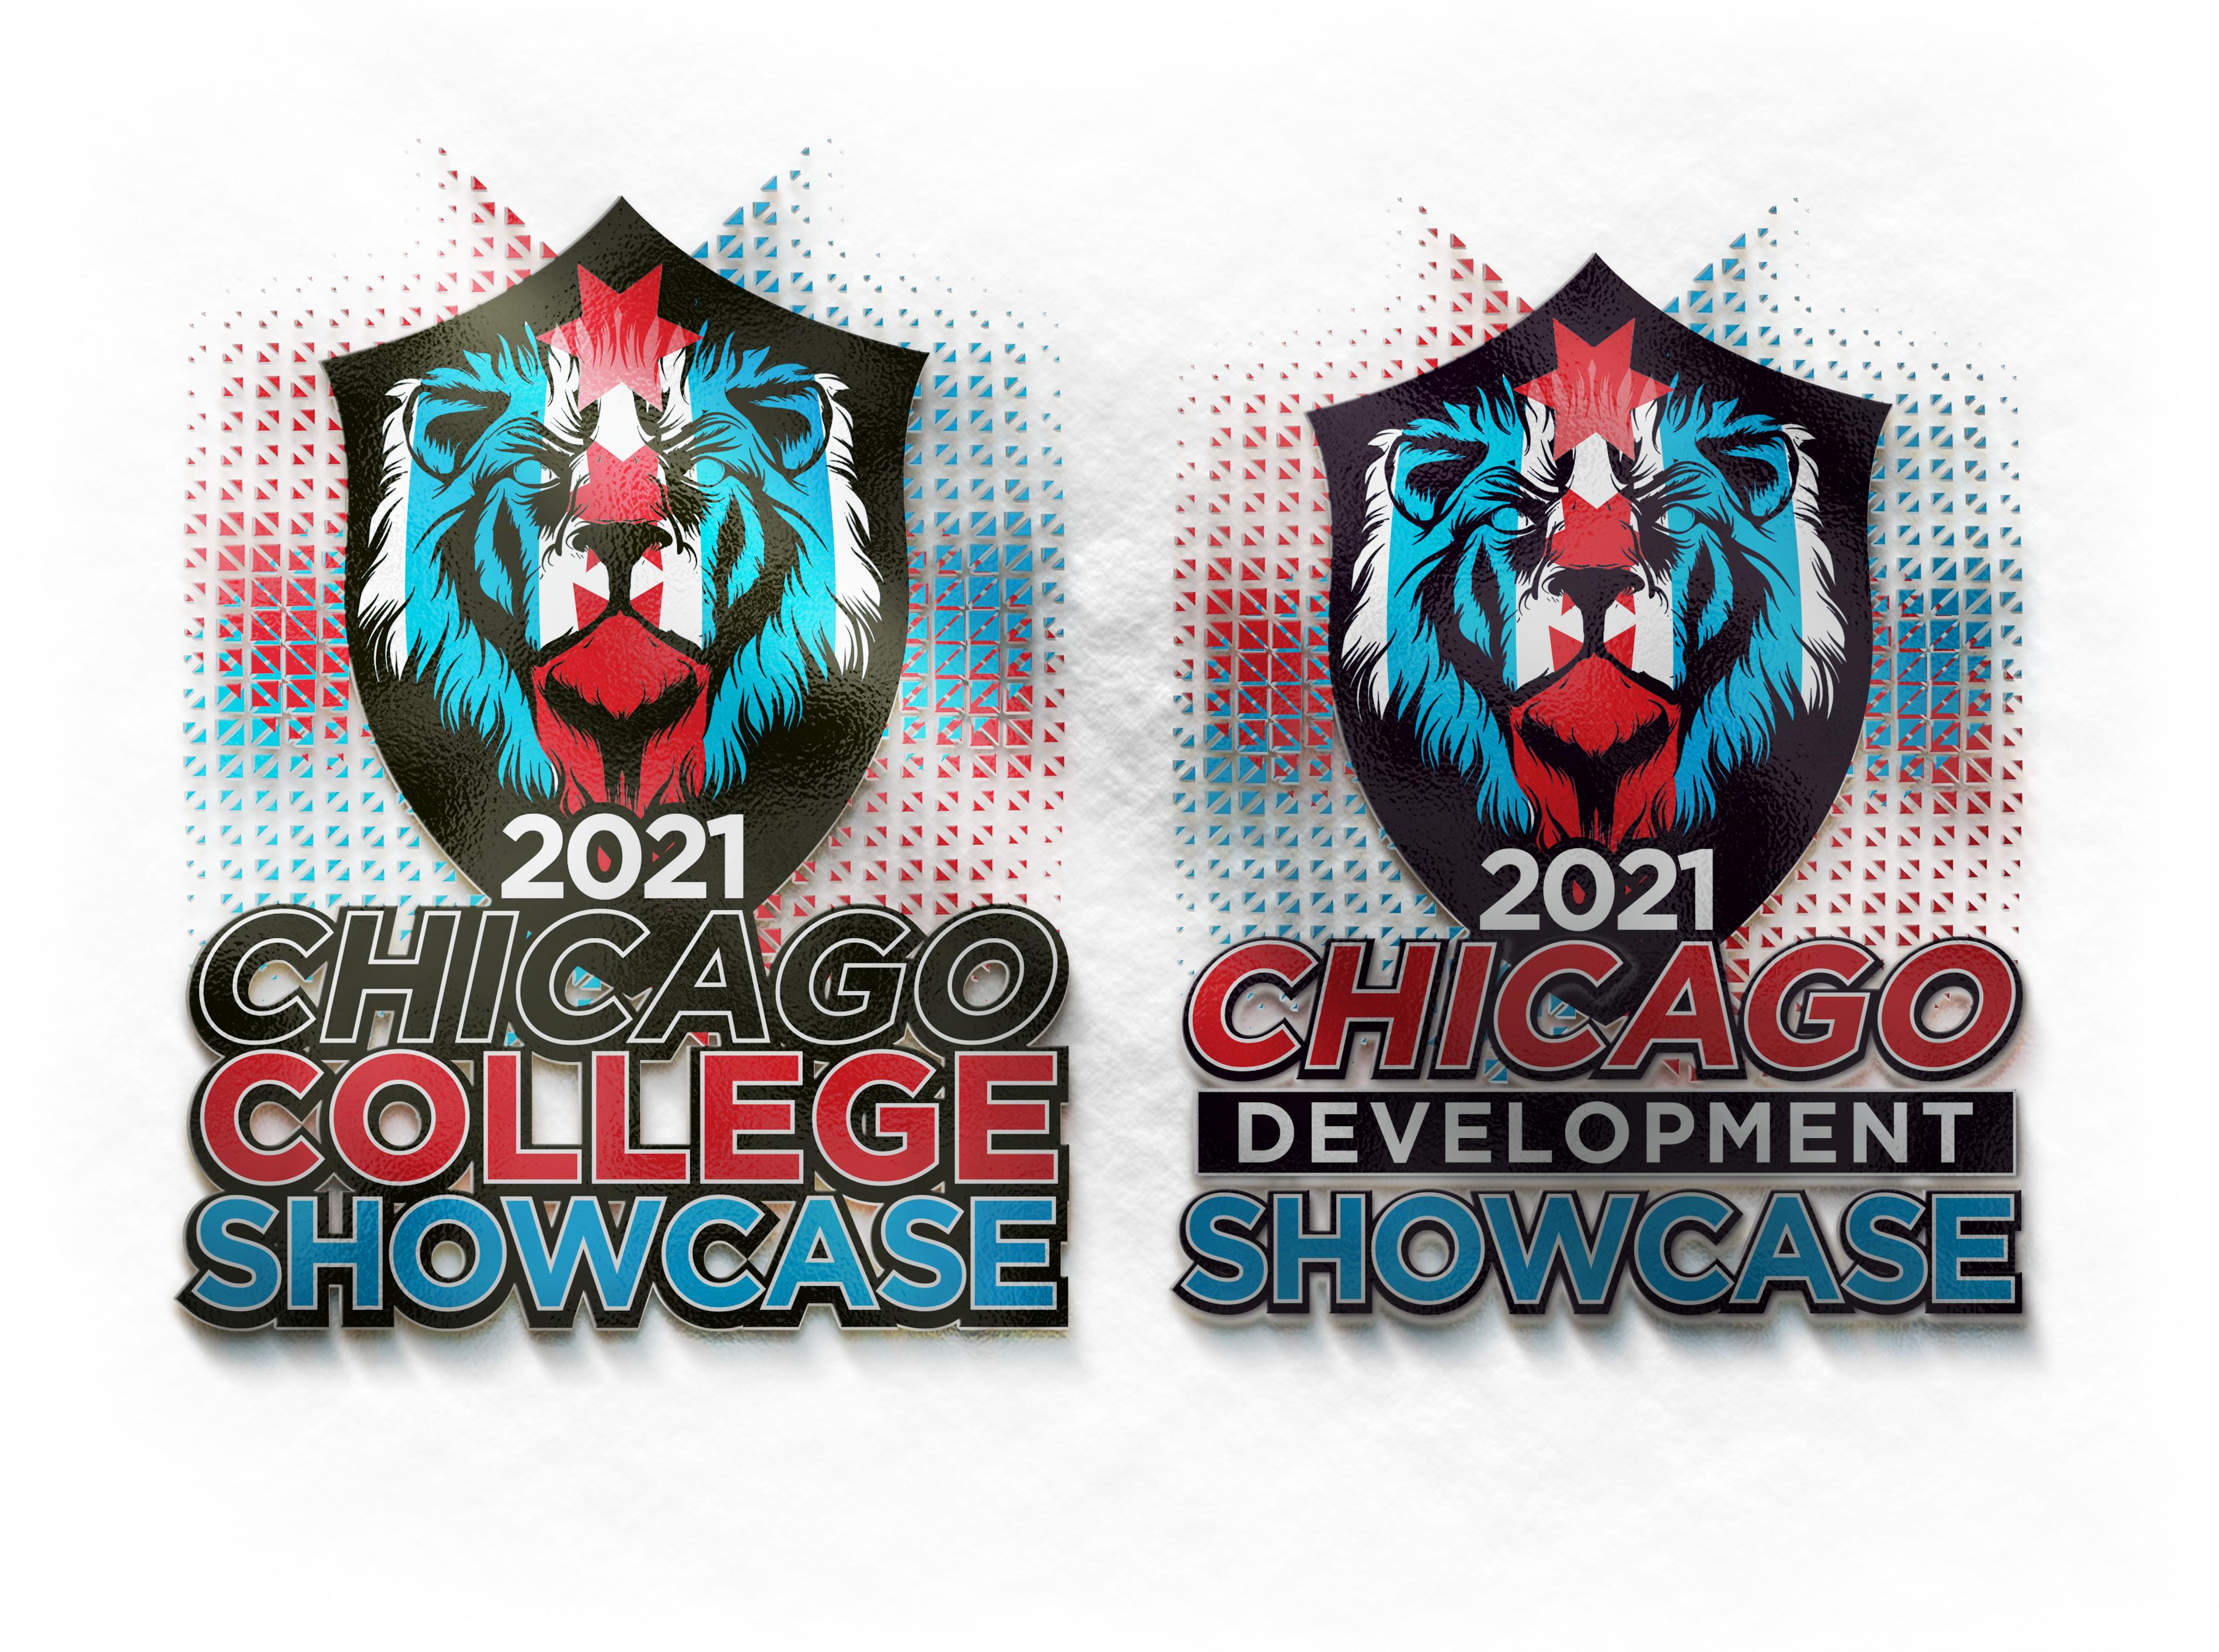 2021 Chicago College & Development Showcase